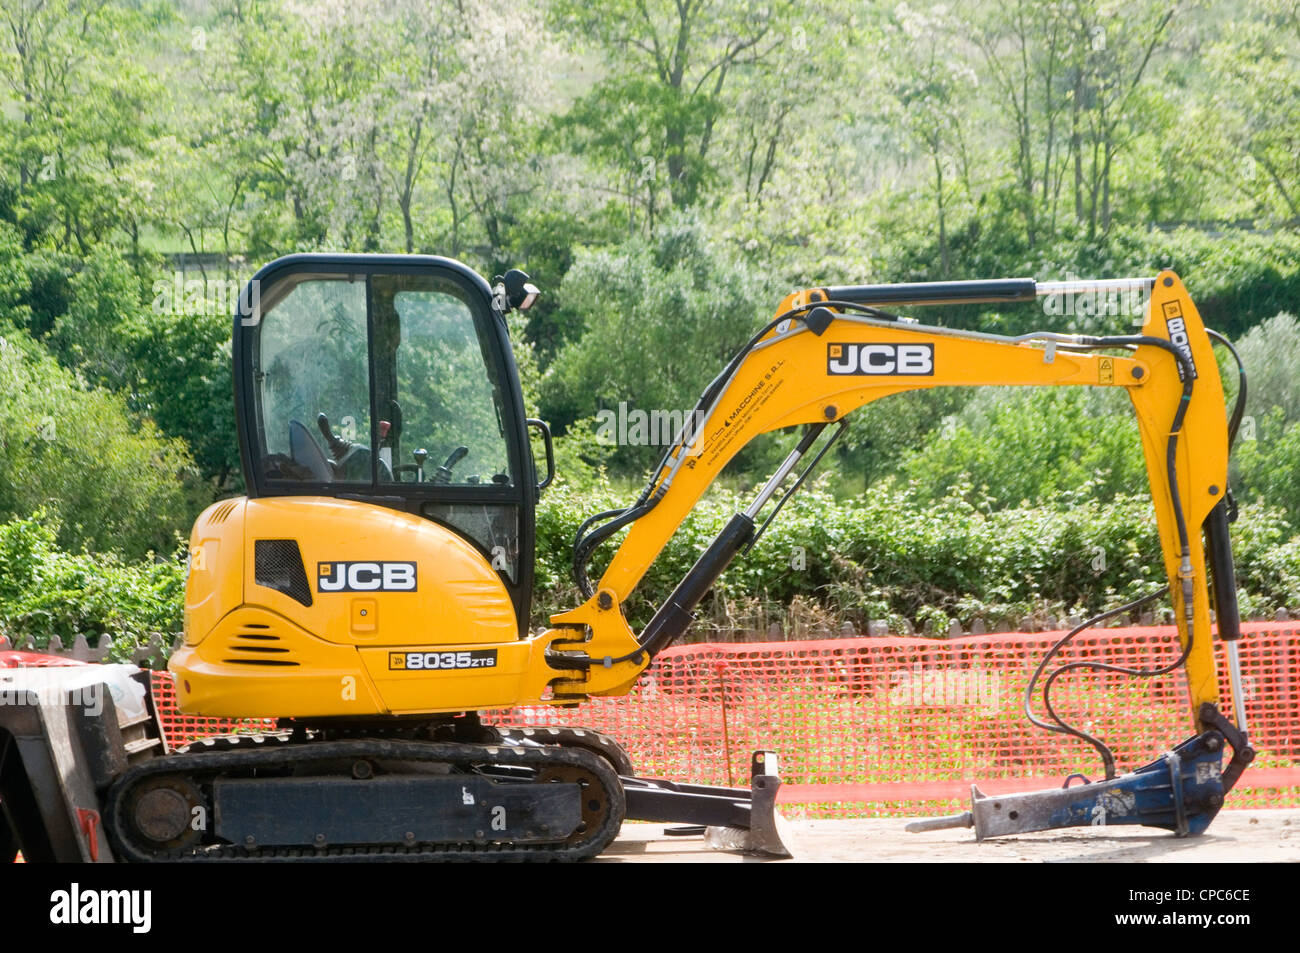 jcb mini digger diggers yellow plant hire earthmover earthmovers